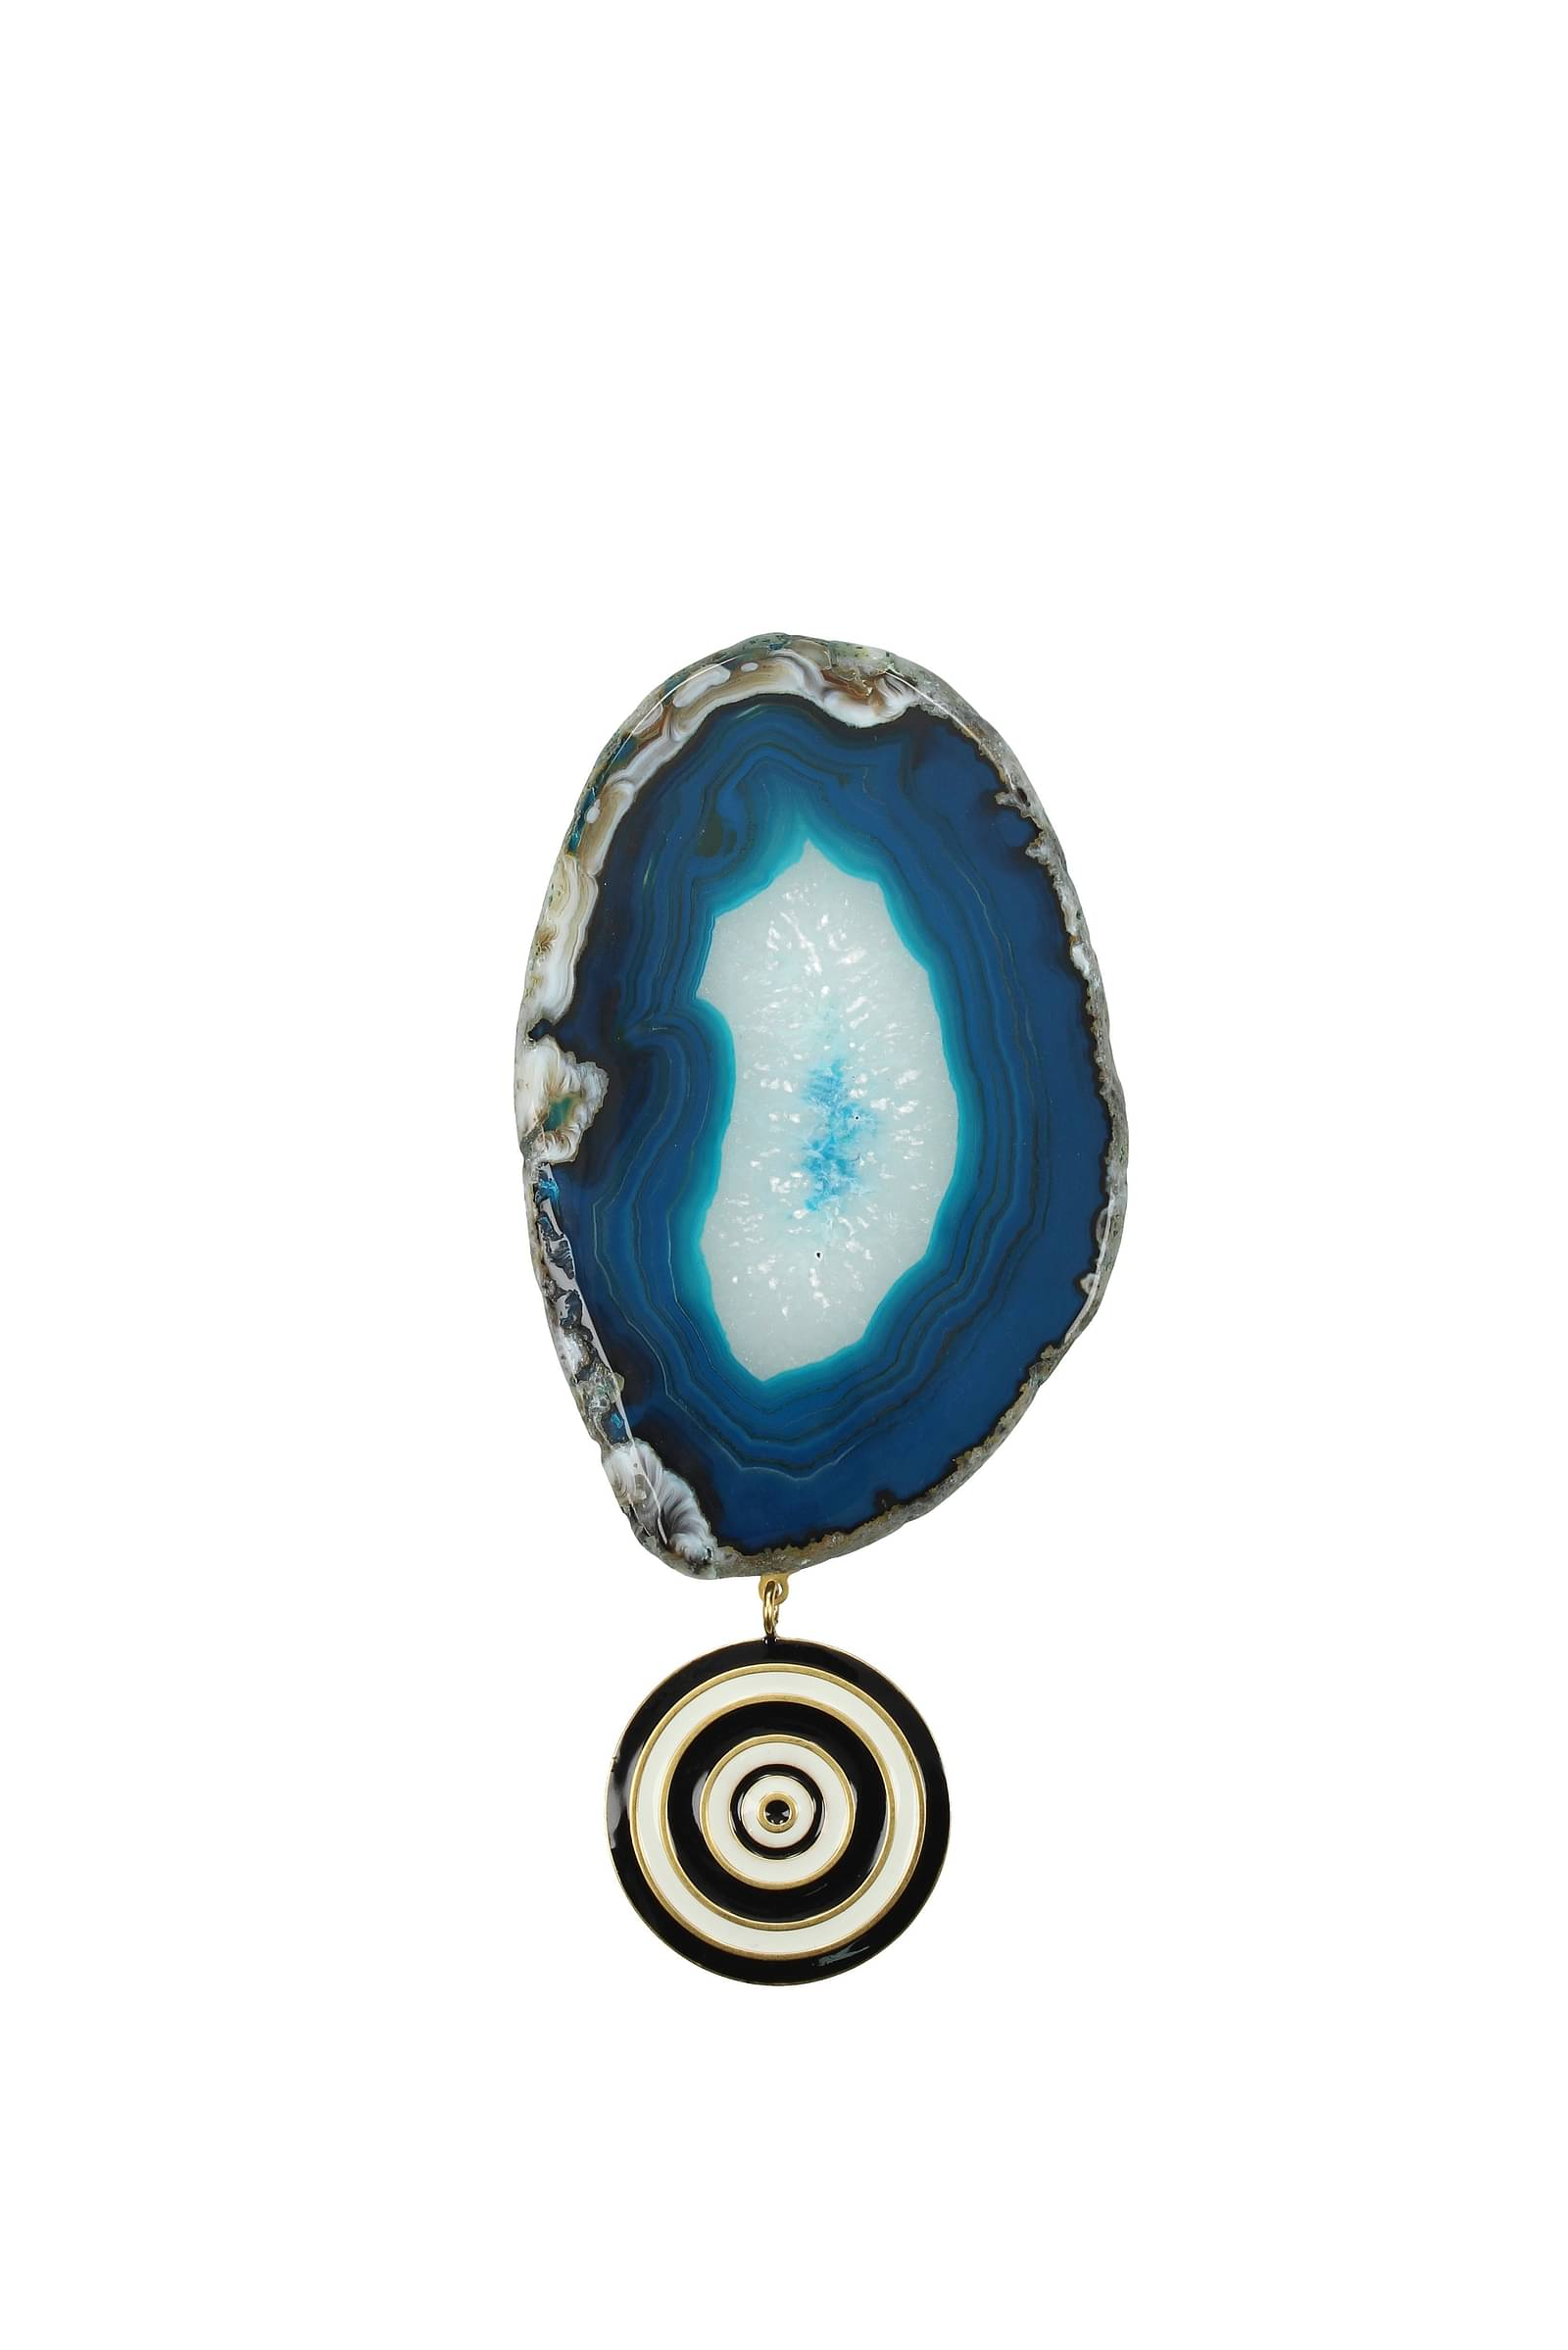 Idee-Regalo-Givenchy-brooch-agate-Donna-Ottone-BF03593910 miniatura 3